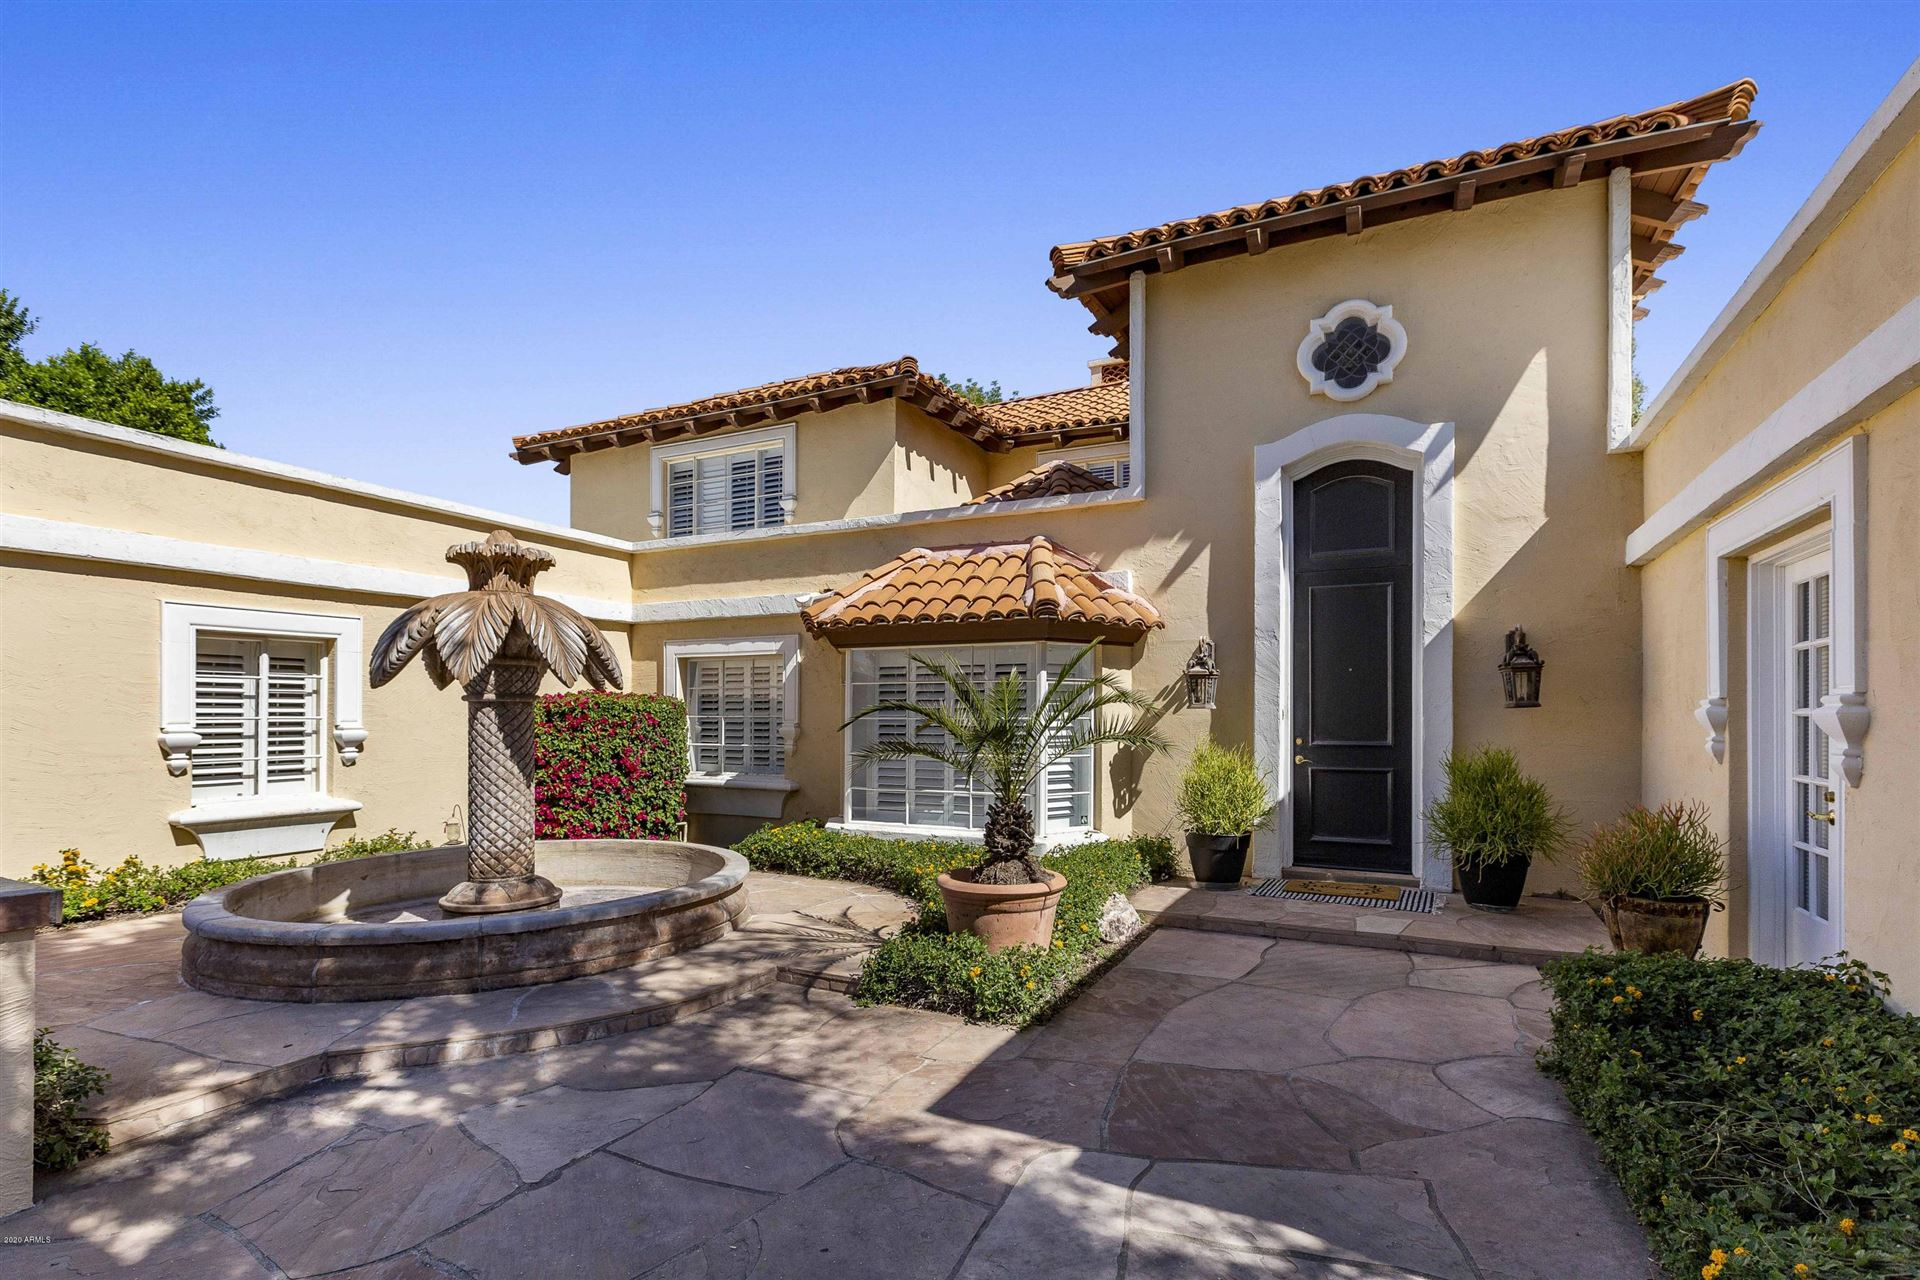 Property Image Of 214 W Kaler Drive In Phoenix, Az